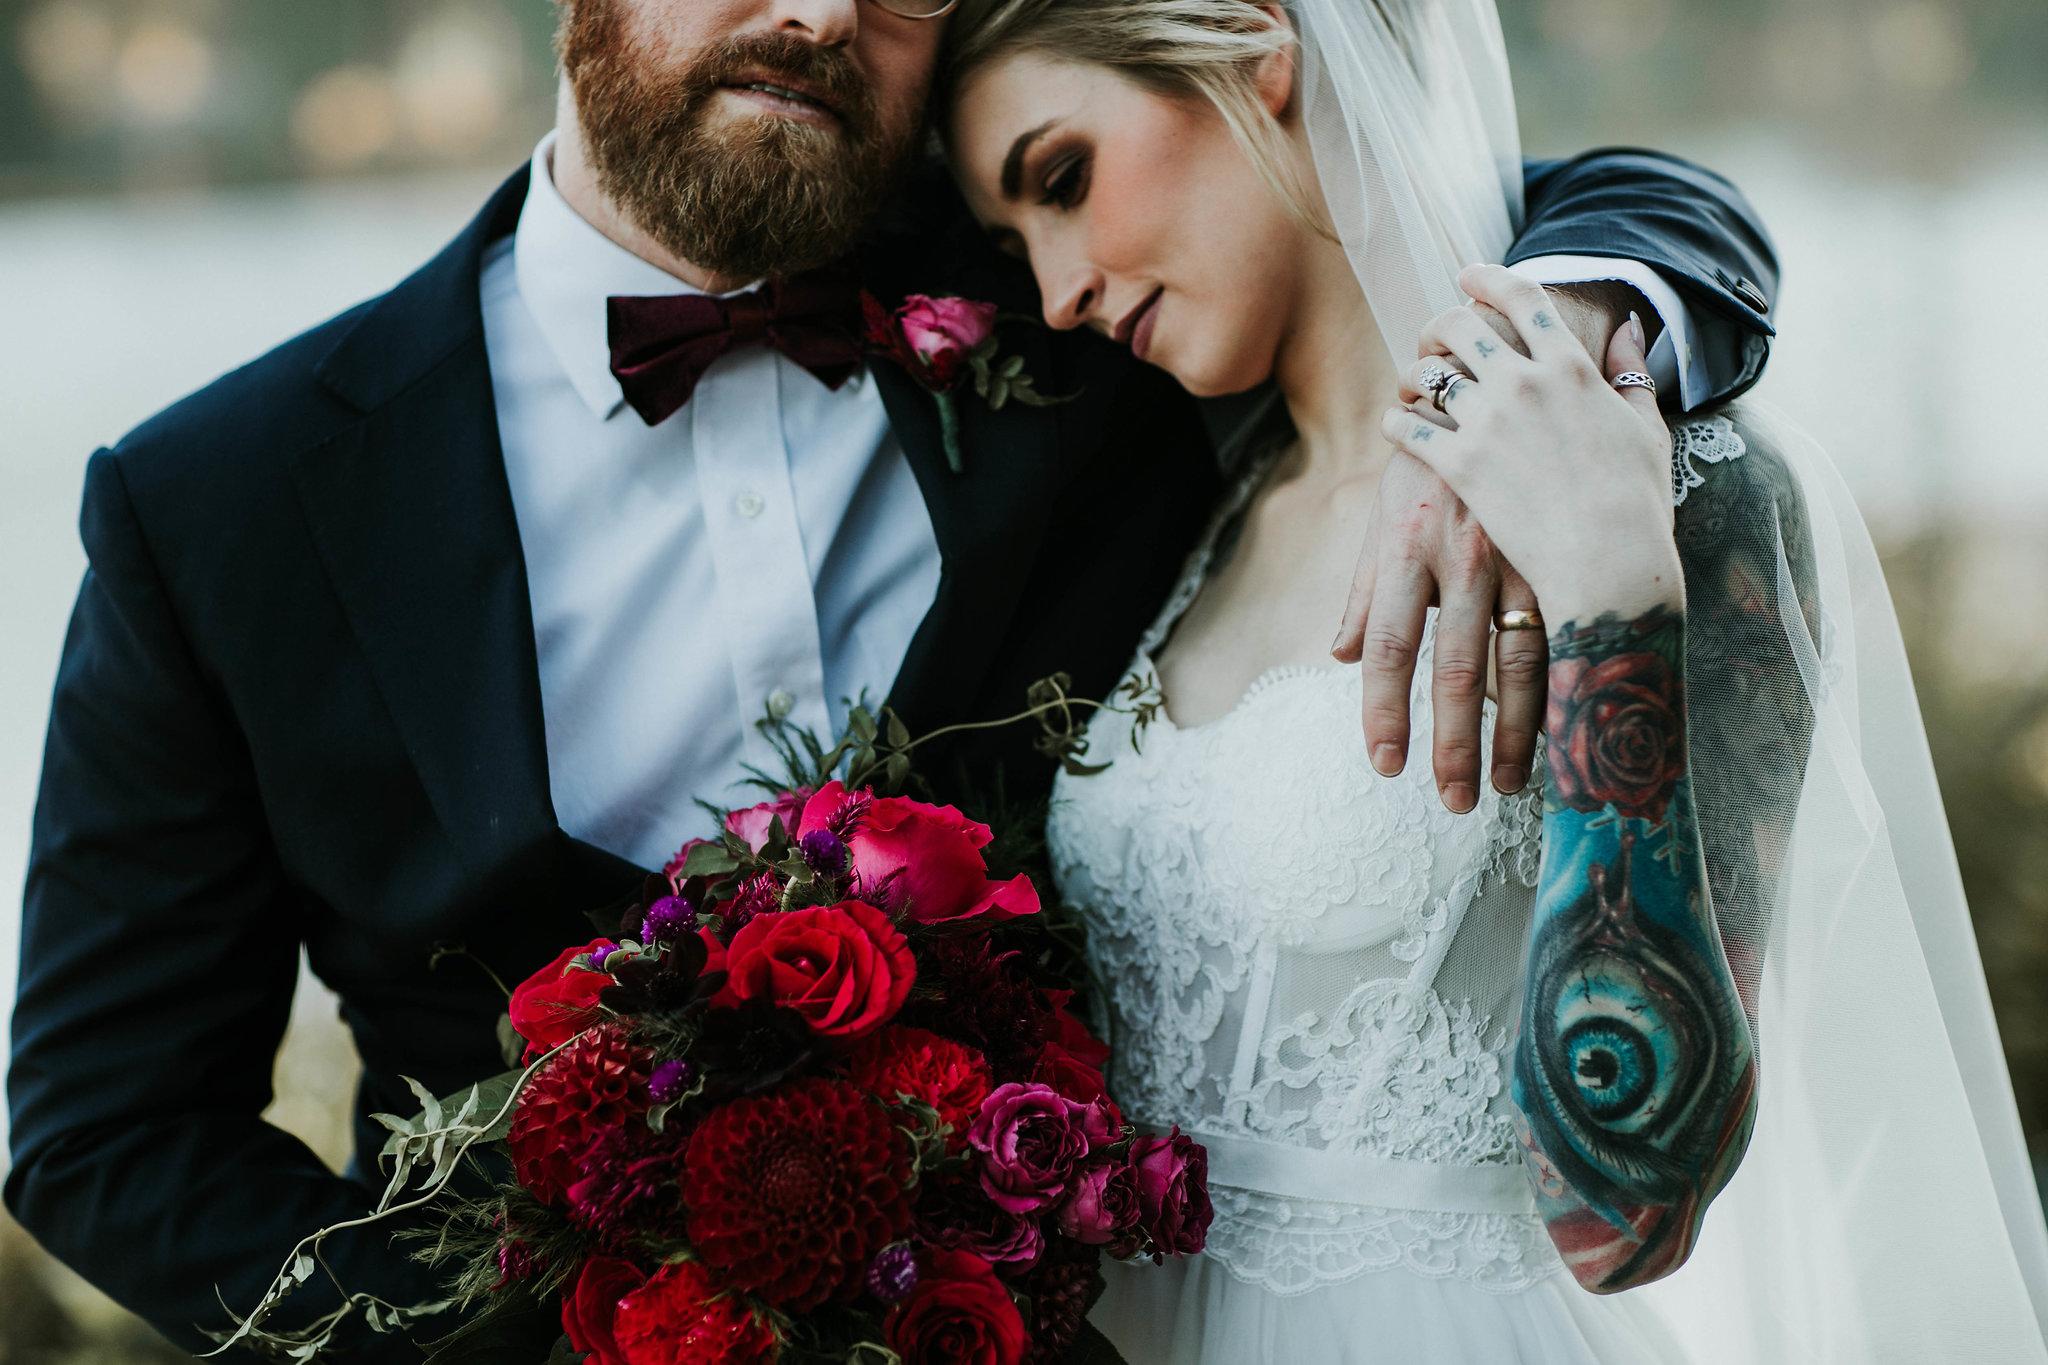 Crystal_Lake_lodge_Wedding_photos_by_Adina_Preston_Weddings_184.JPG